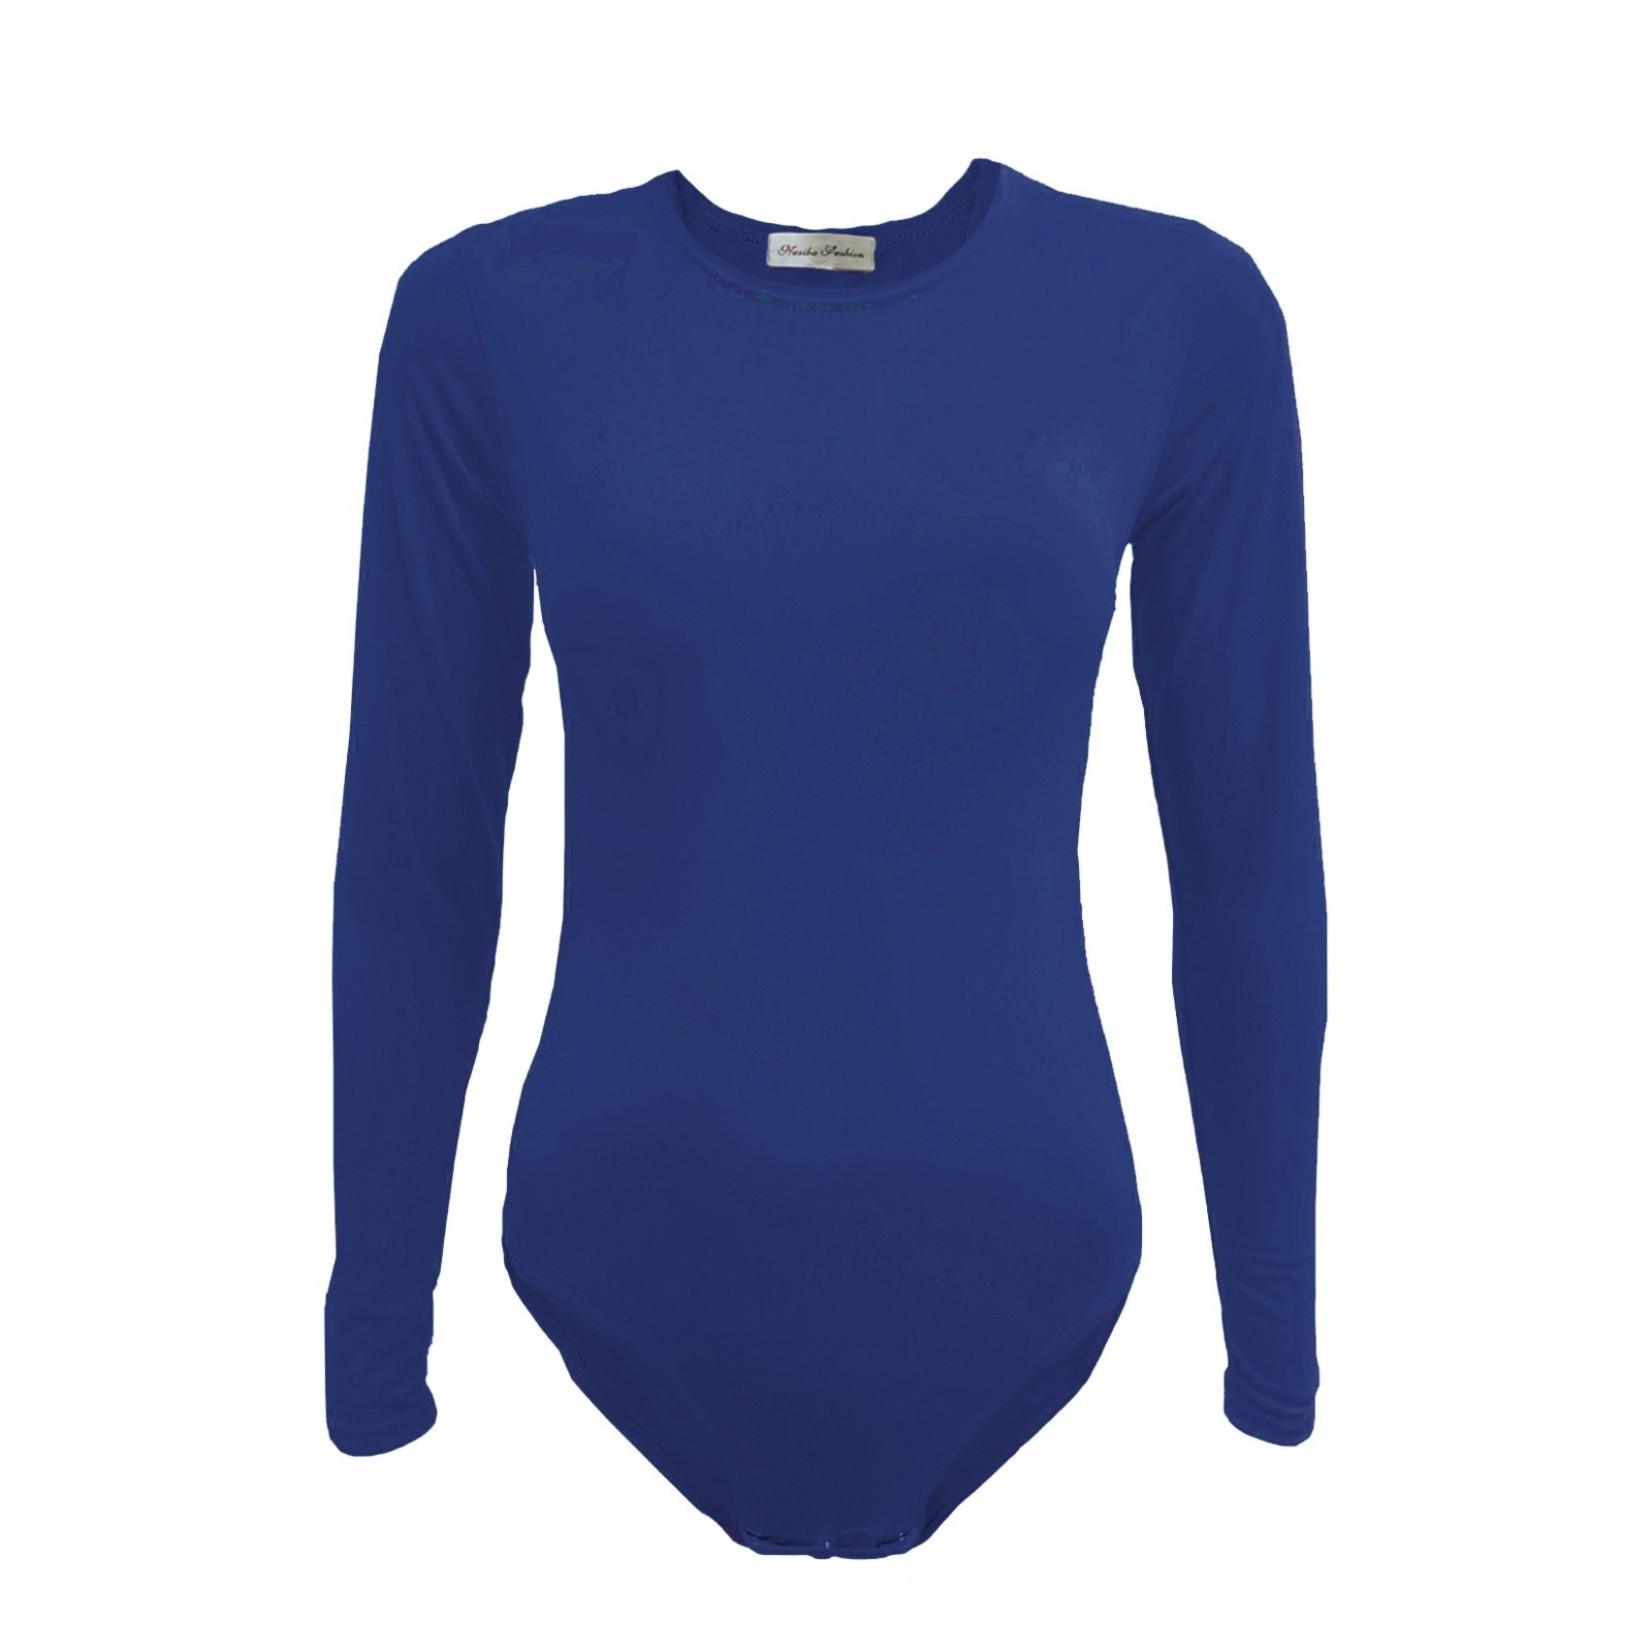 Nasiba Fashion Mid Blue Bodysuit